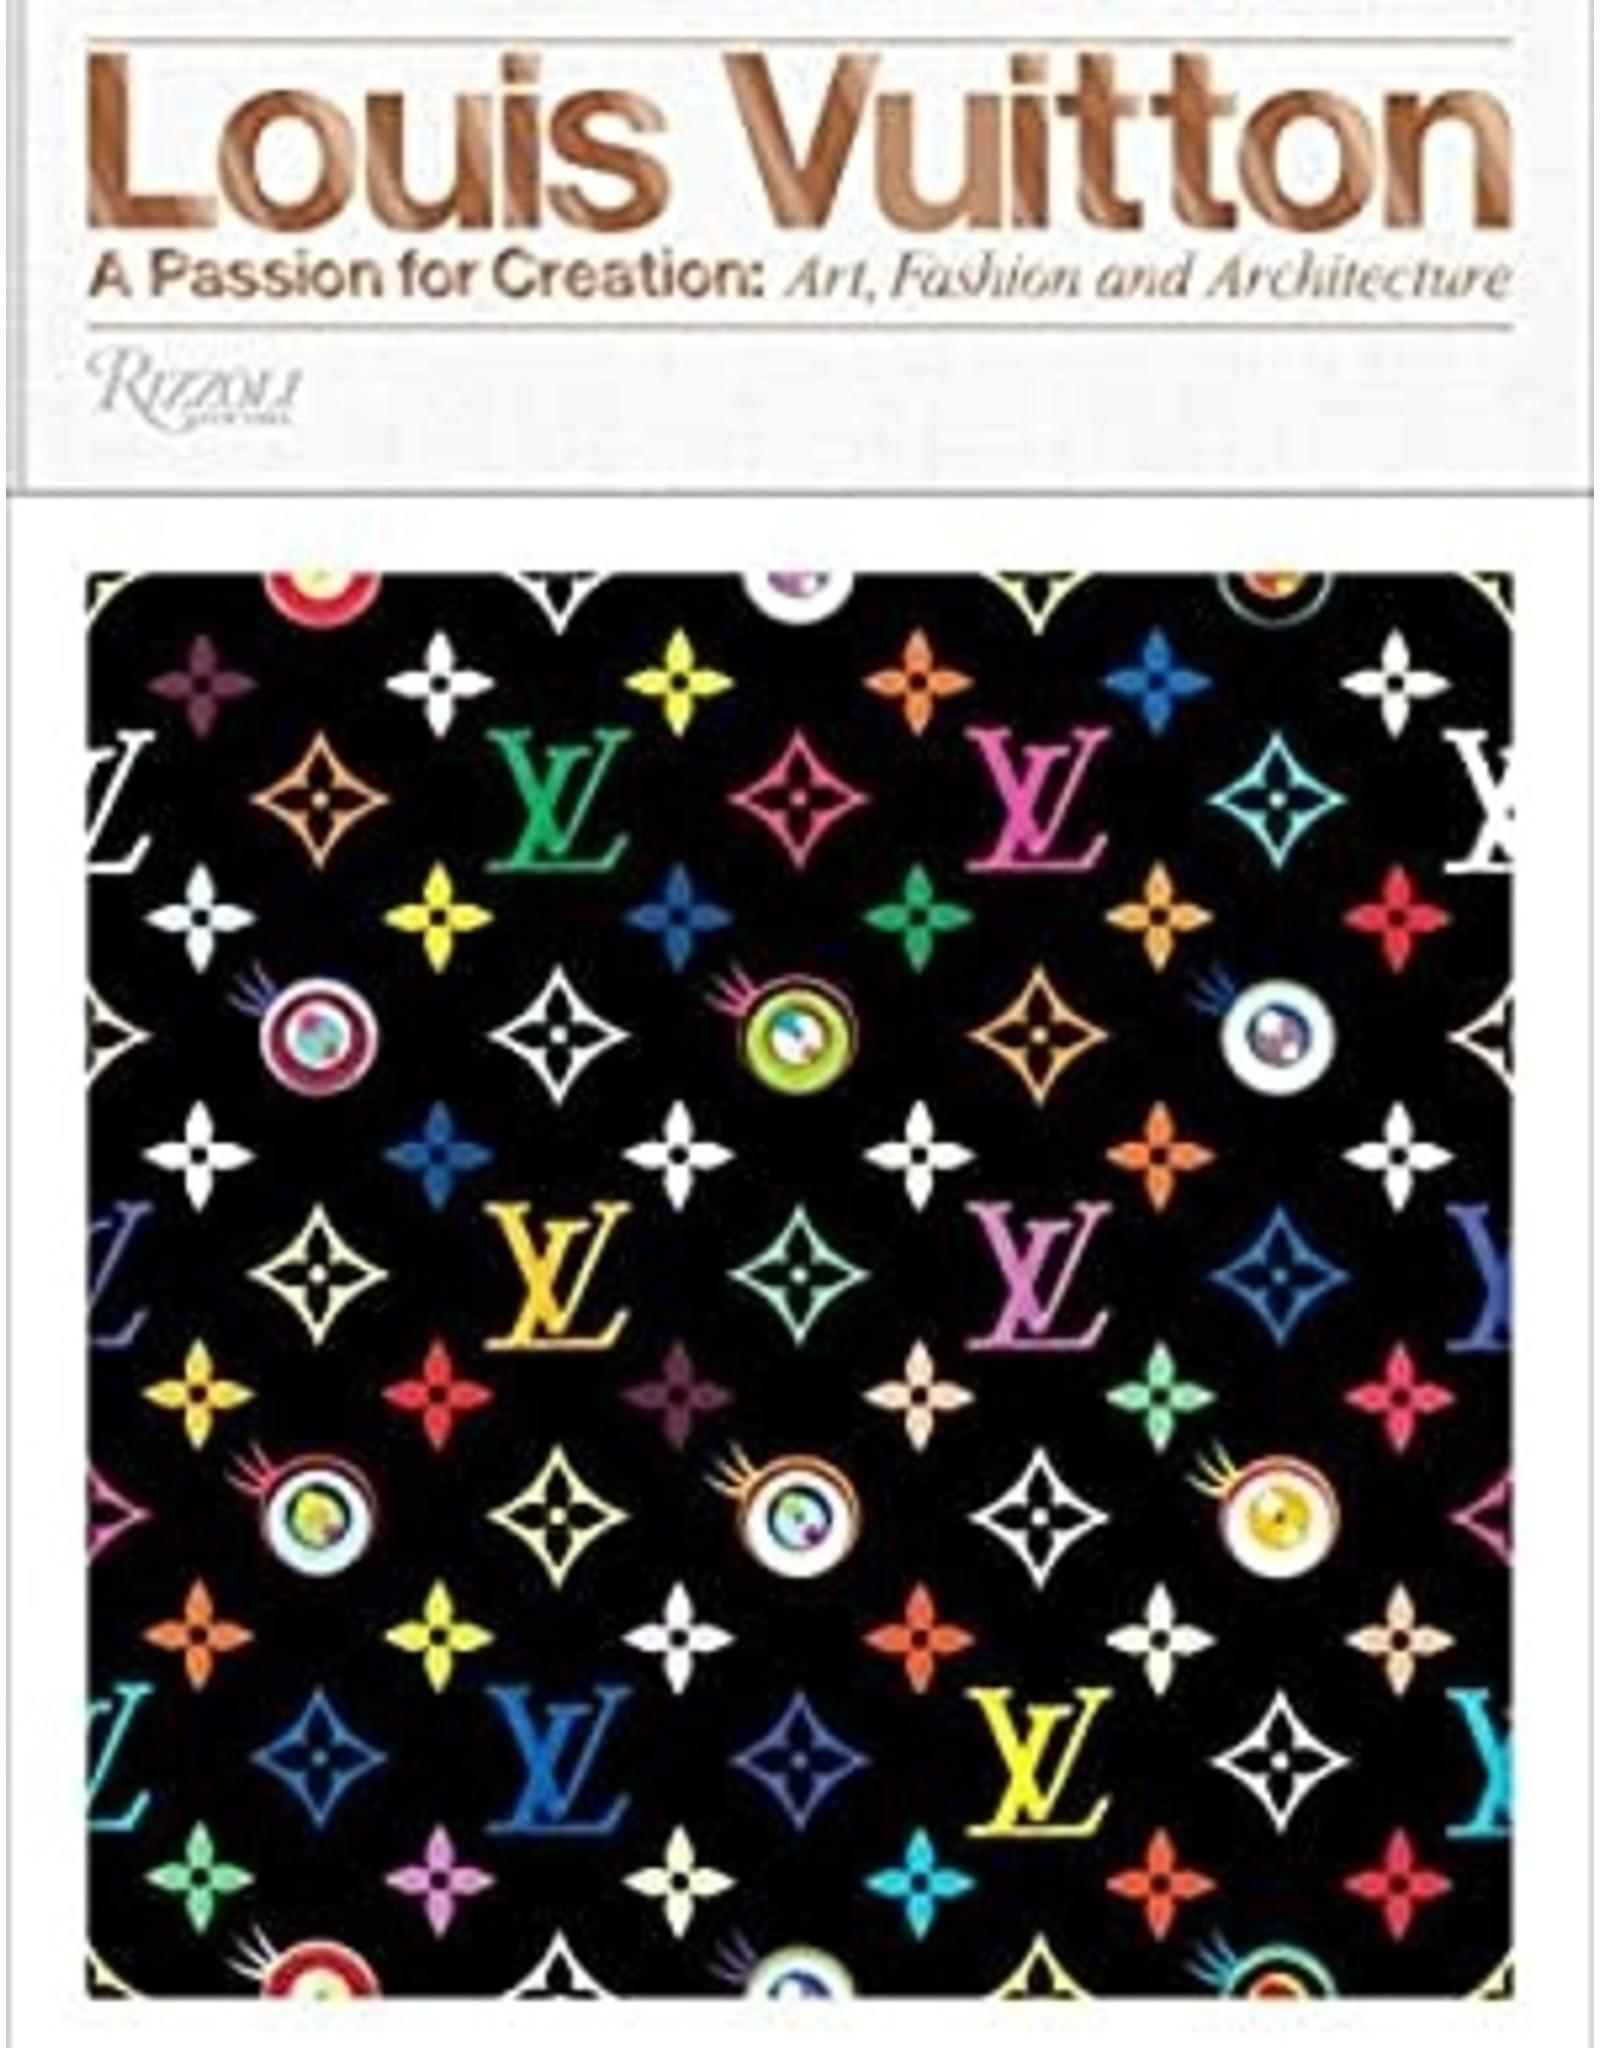 Website Louis Vuitton: A Passion for Creation